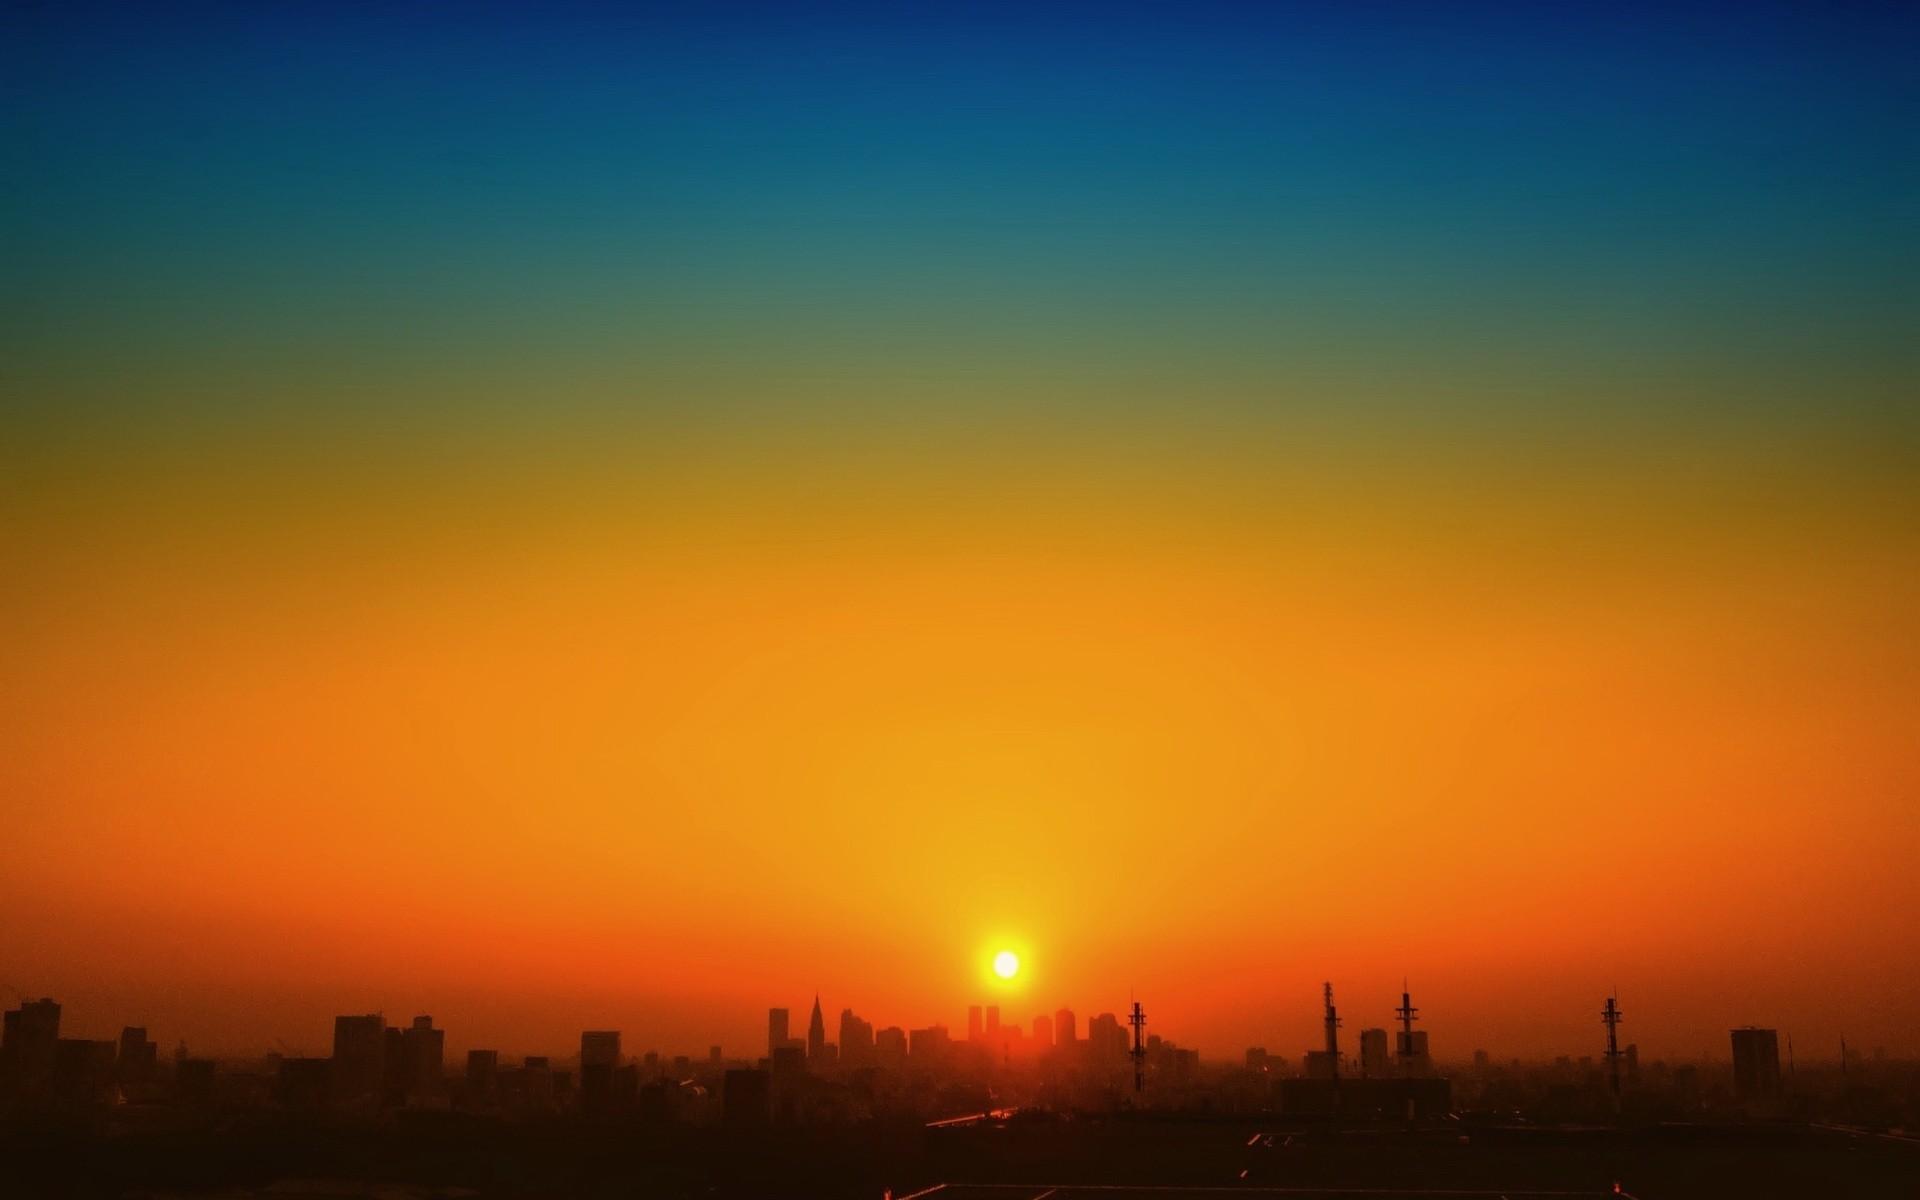 картинки город на восходе солнца живописная коряга нашлась